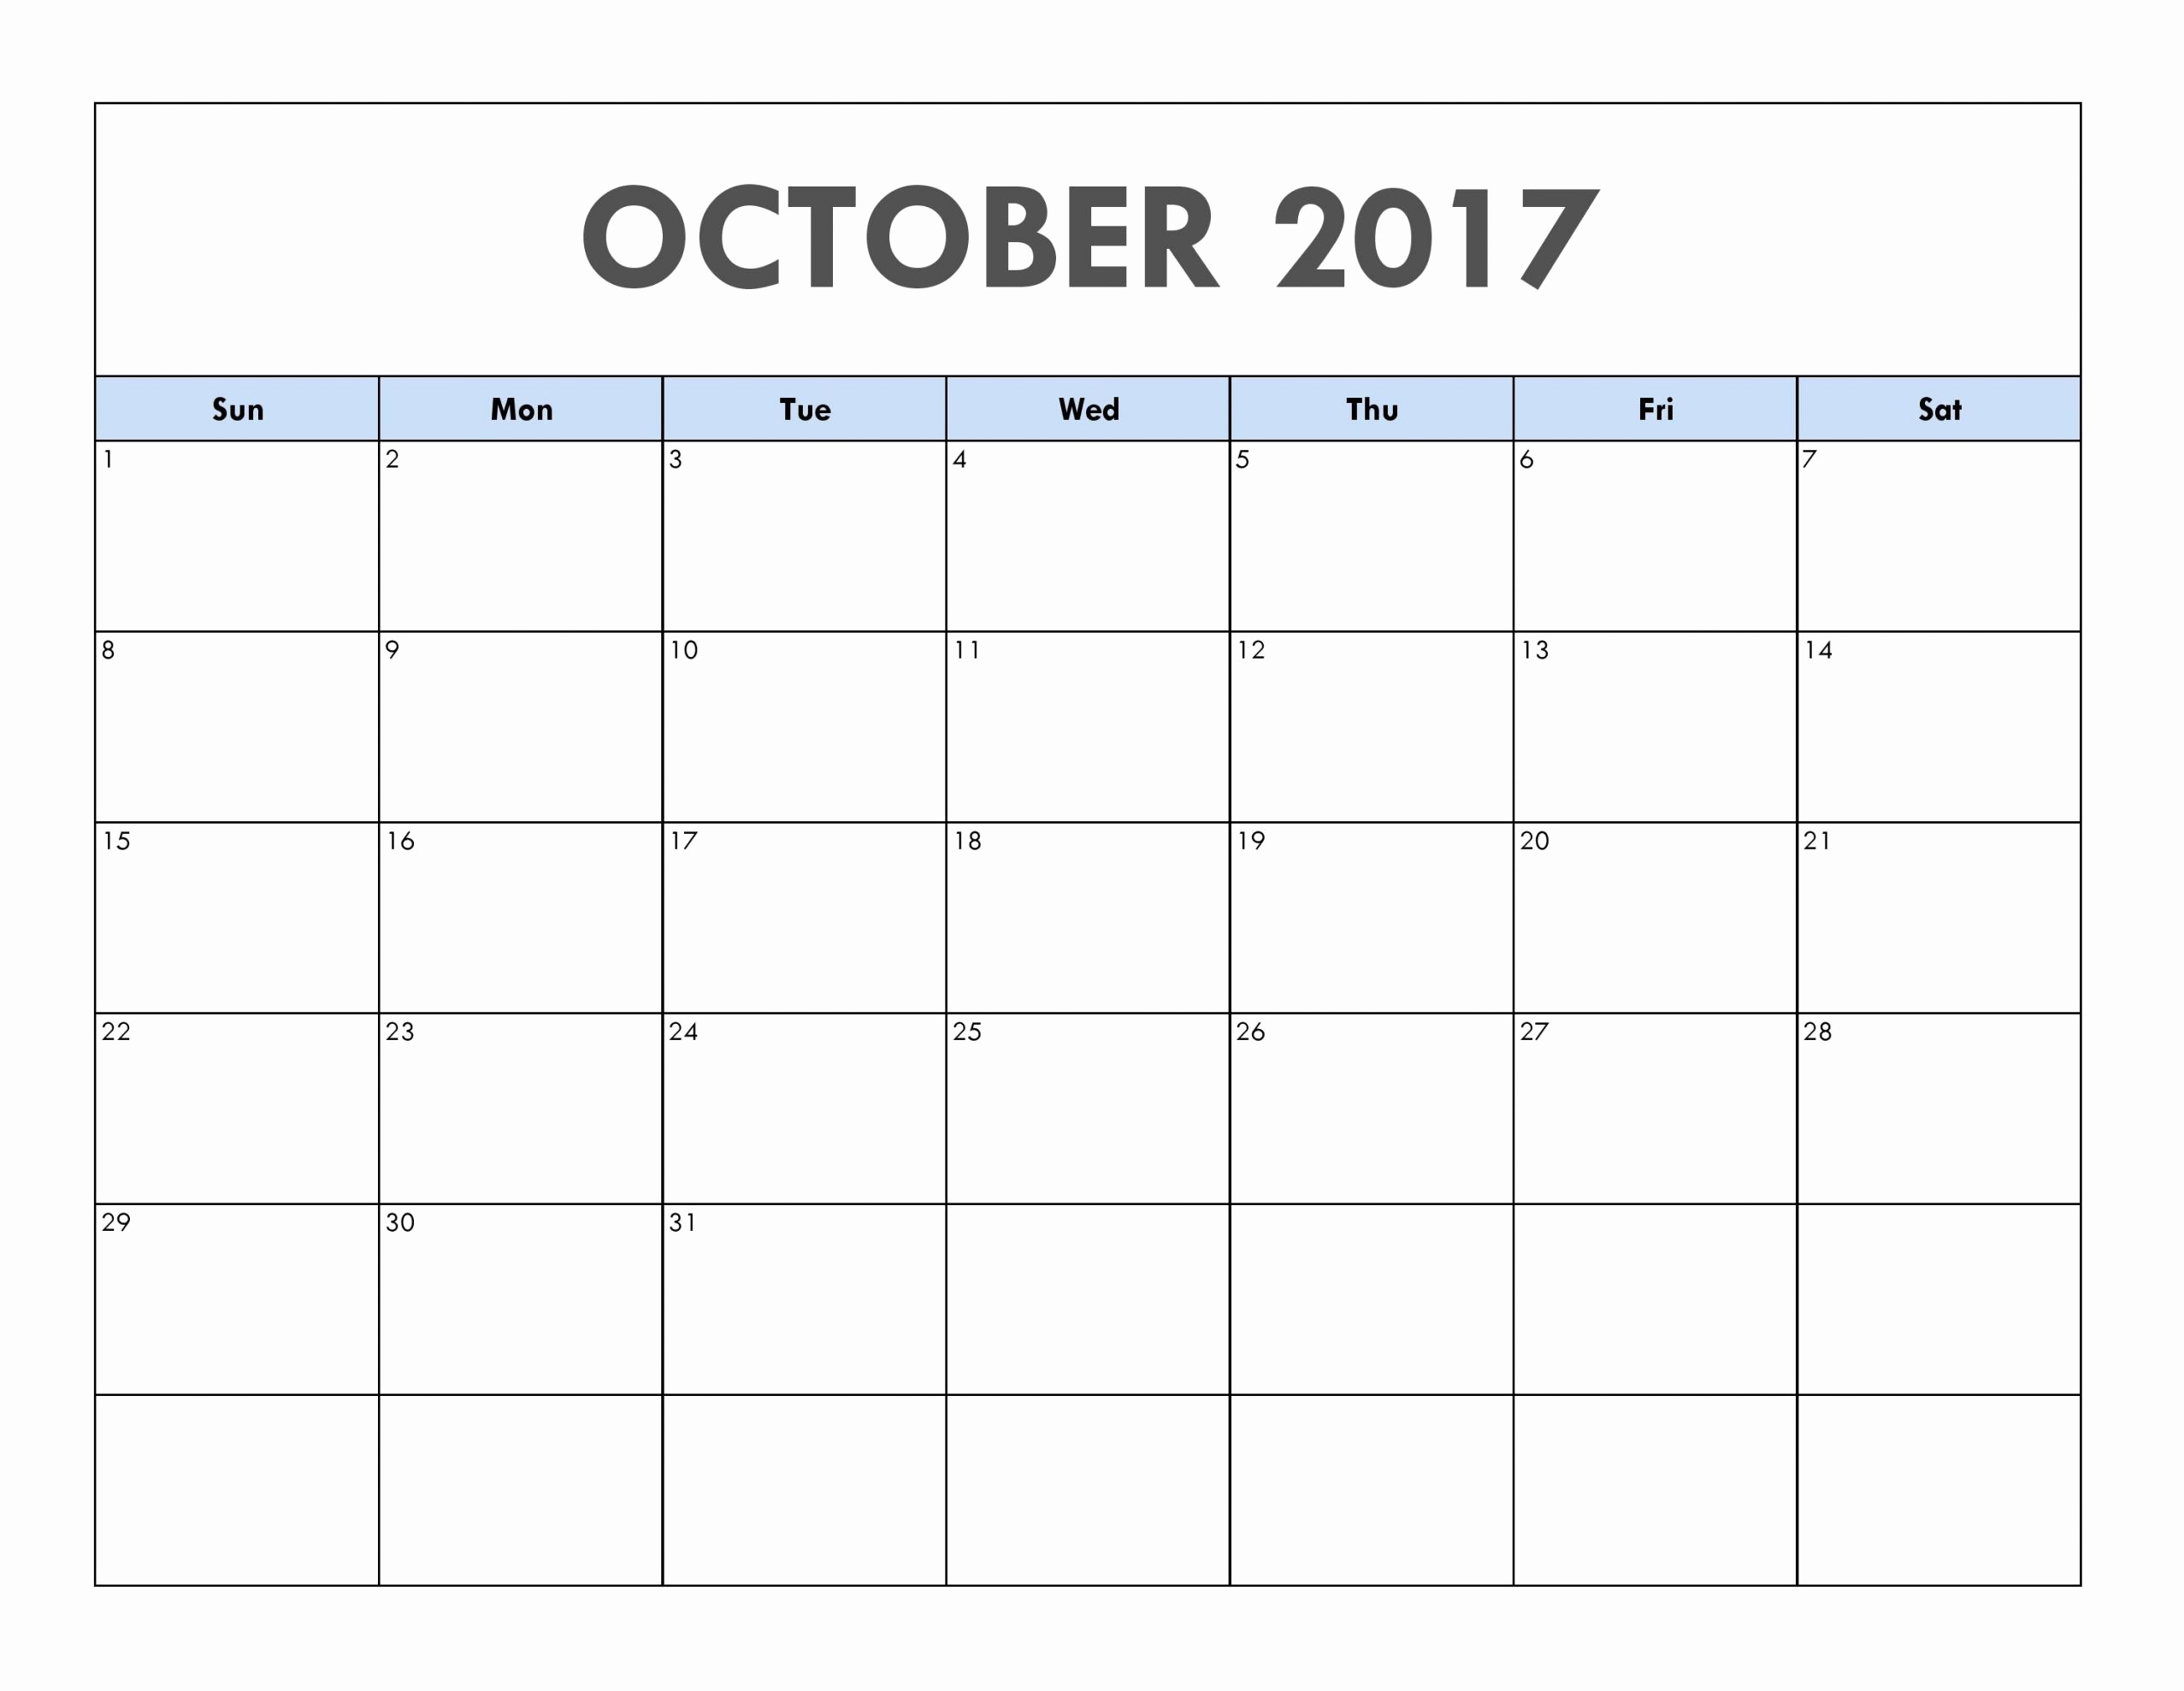 Blank Calendar Template August 2017 New October 2017 Calendar Printable Template